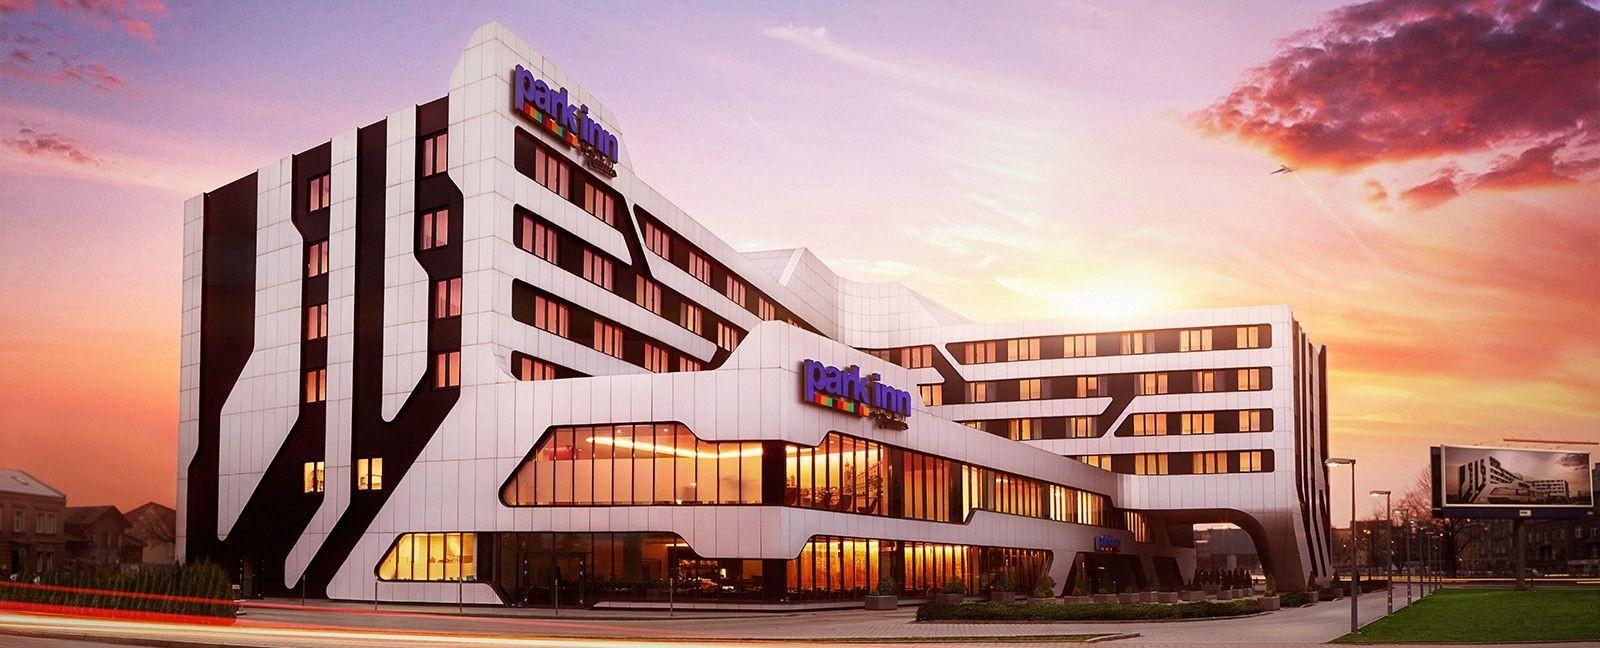 Park Inn by Radisson Hotel